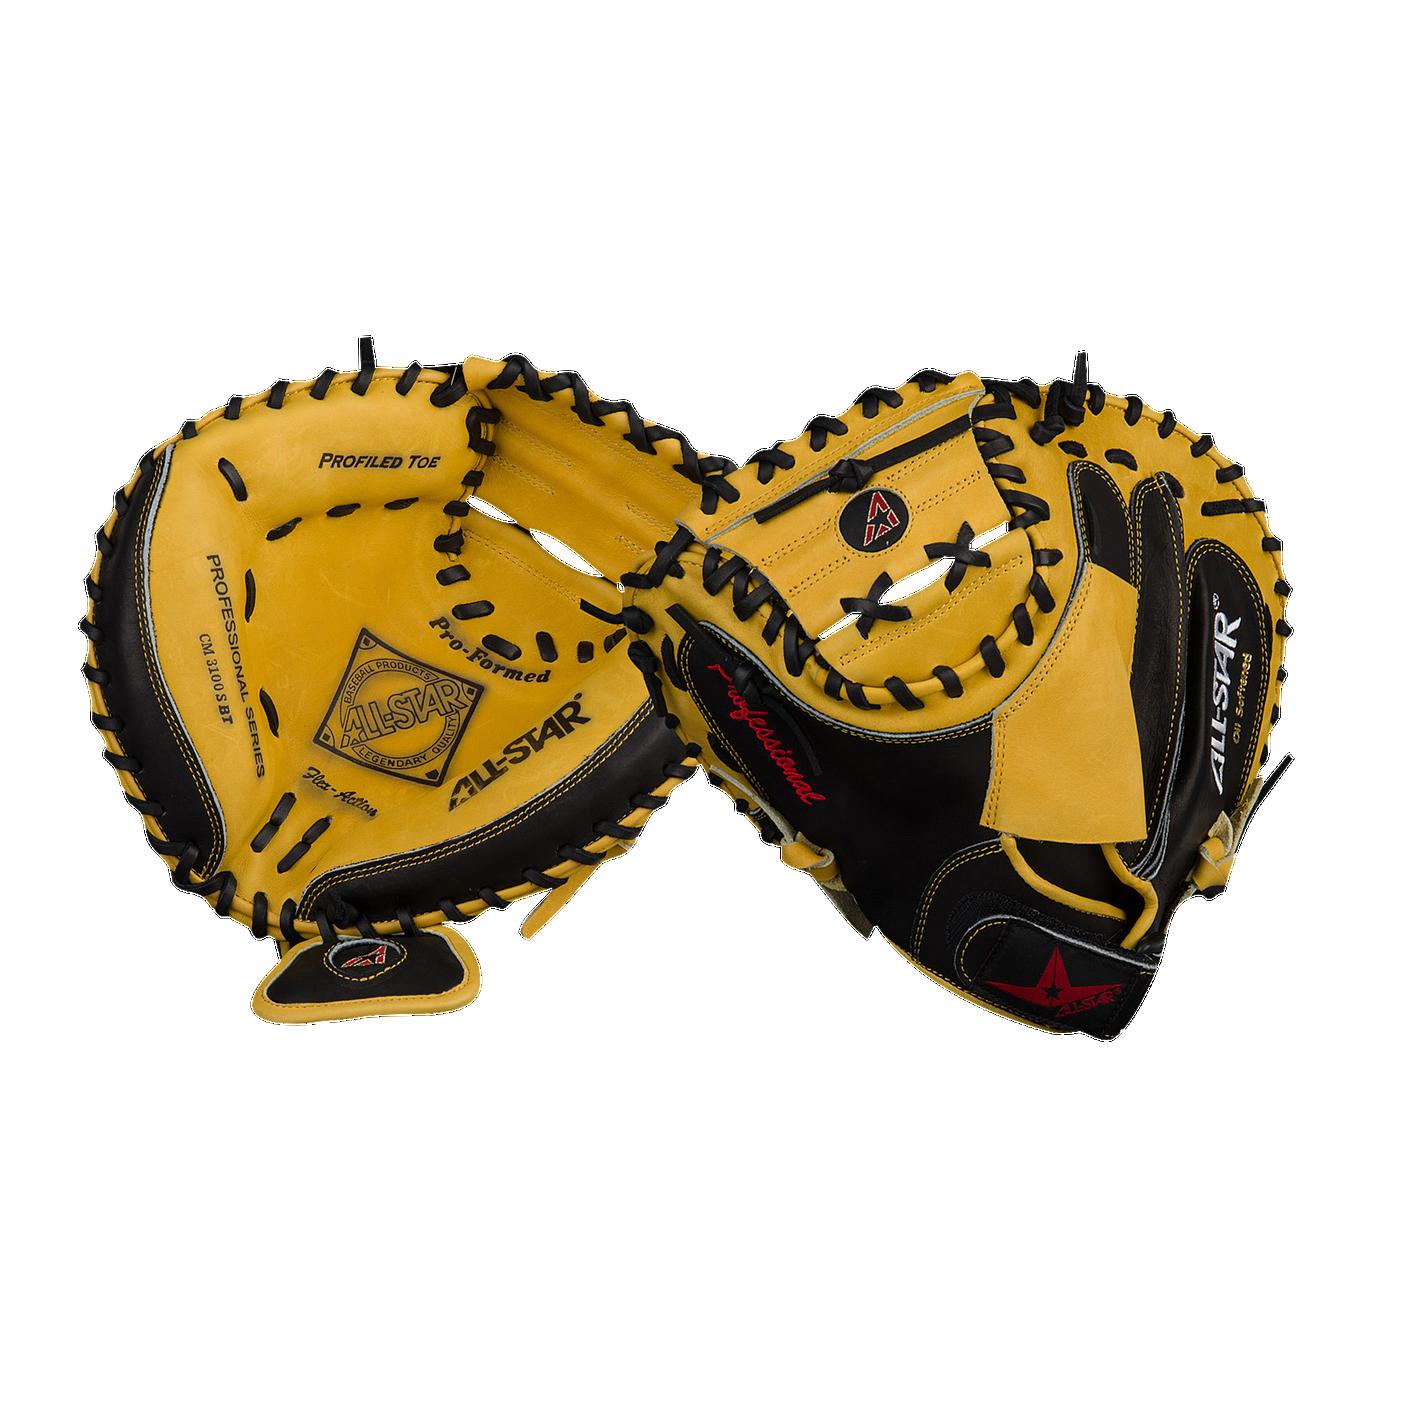 All Star Pro-Advanced CM3100 Catcher's Mitt - Adult